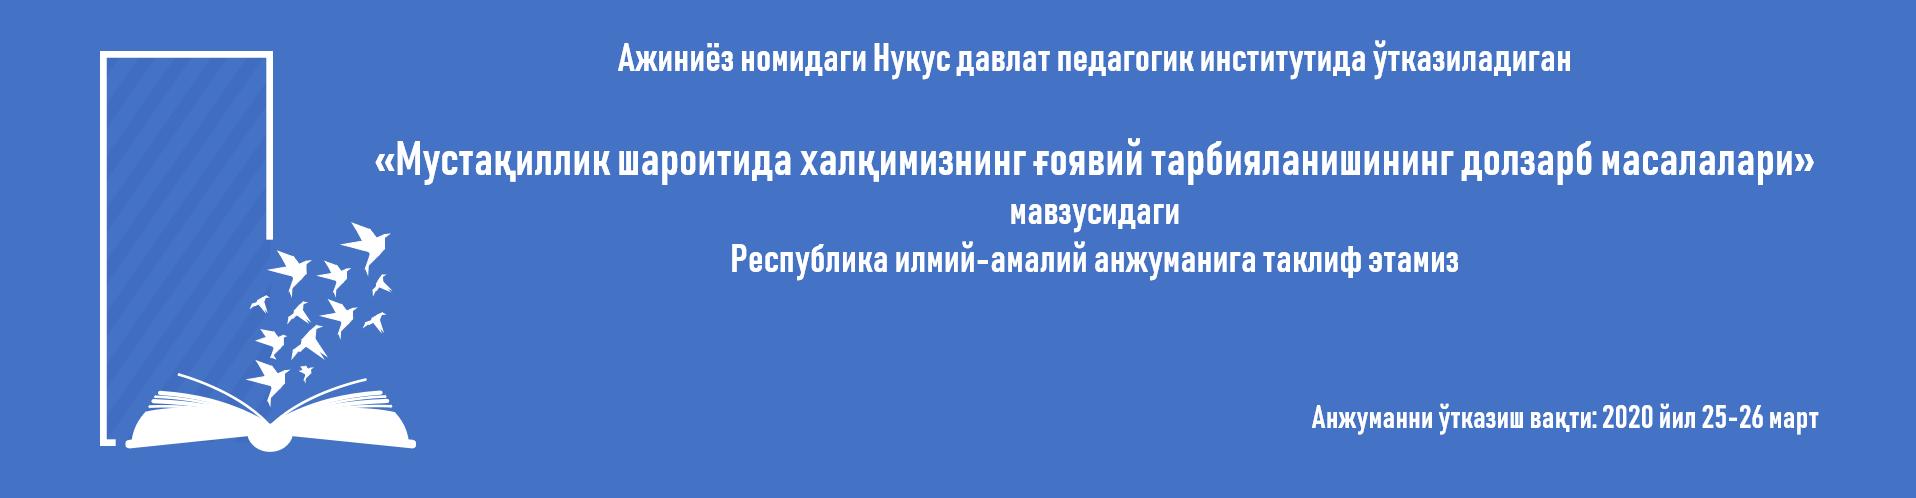 konf6 - Республикалық илимий-әмелий конференция